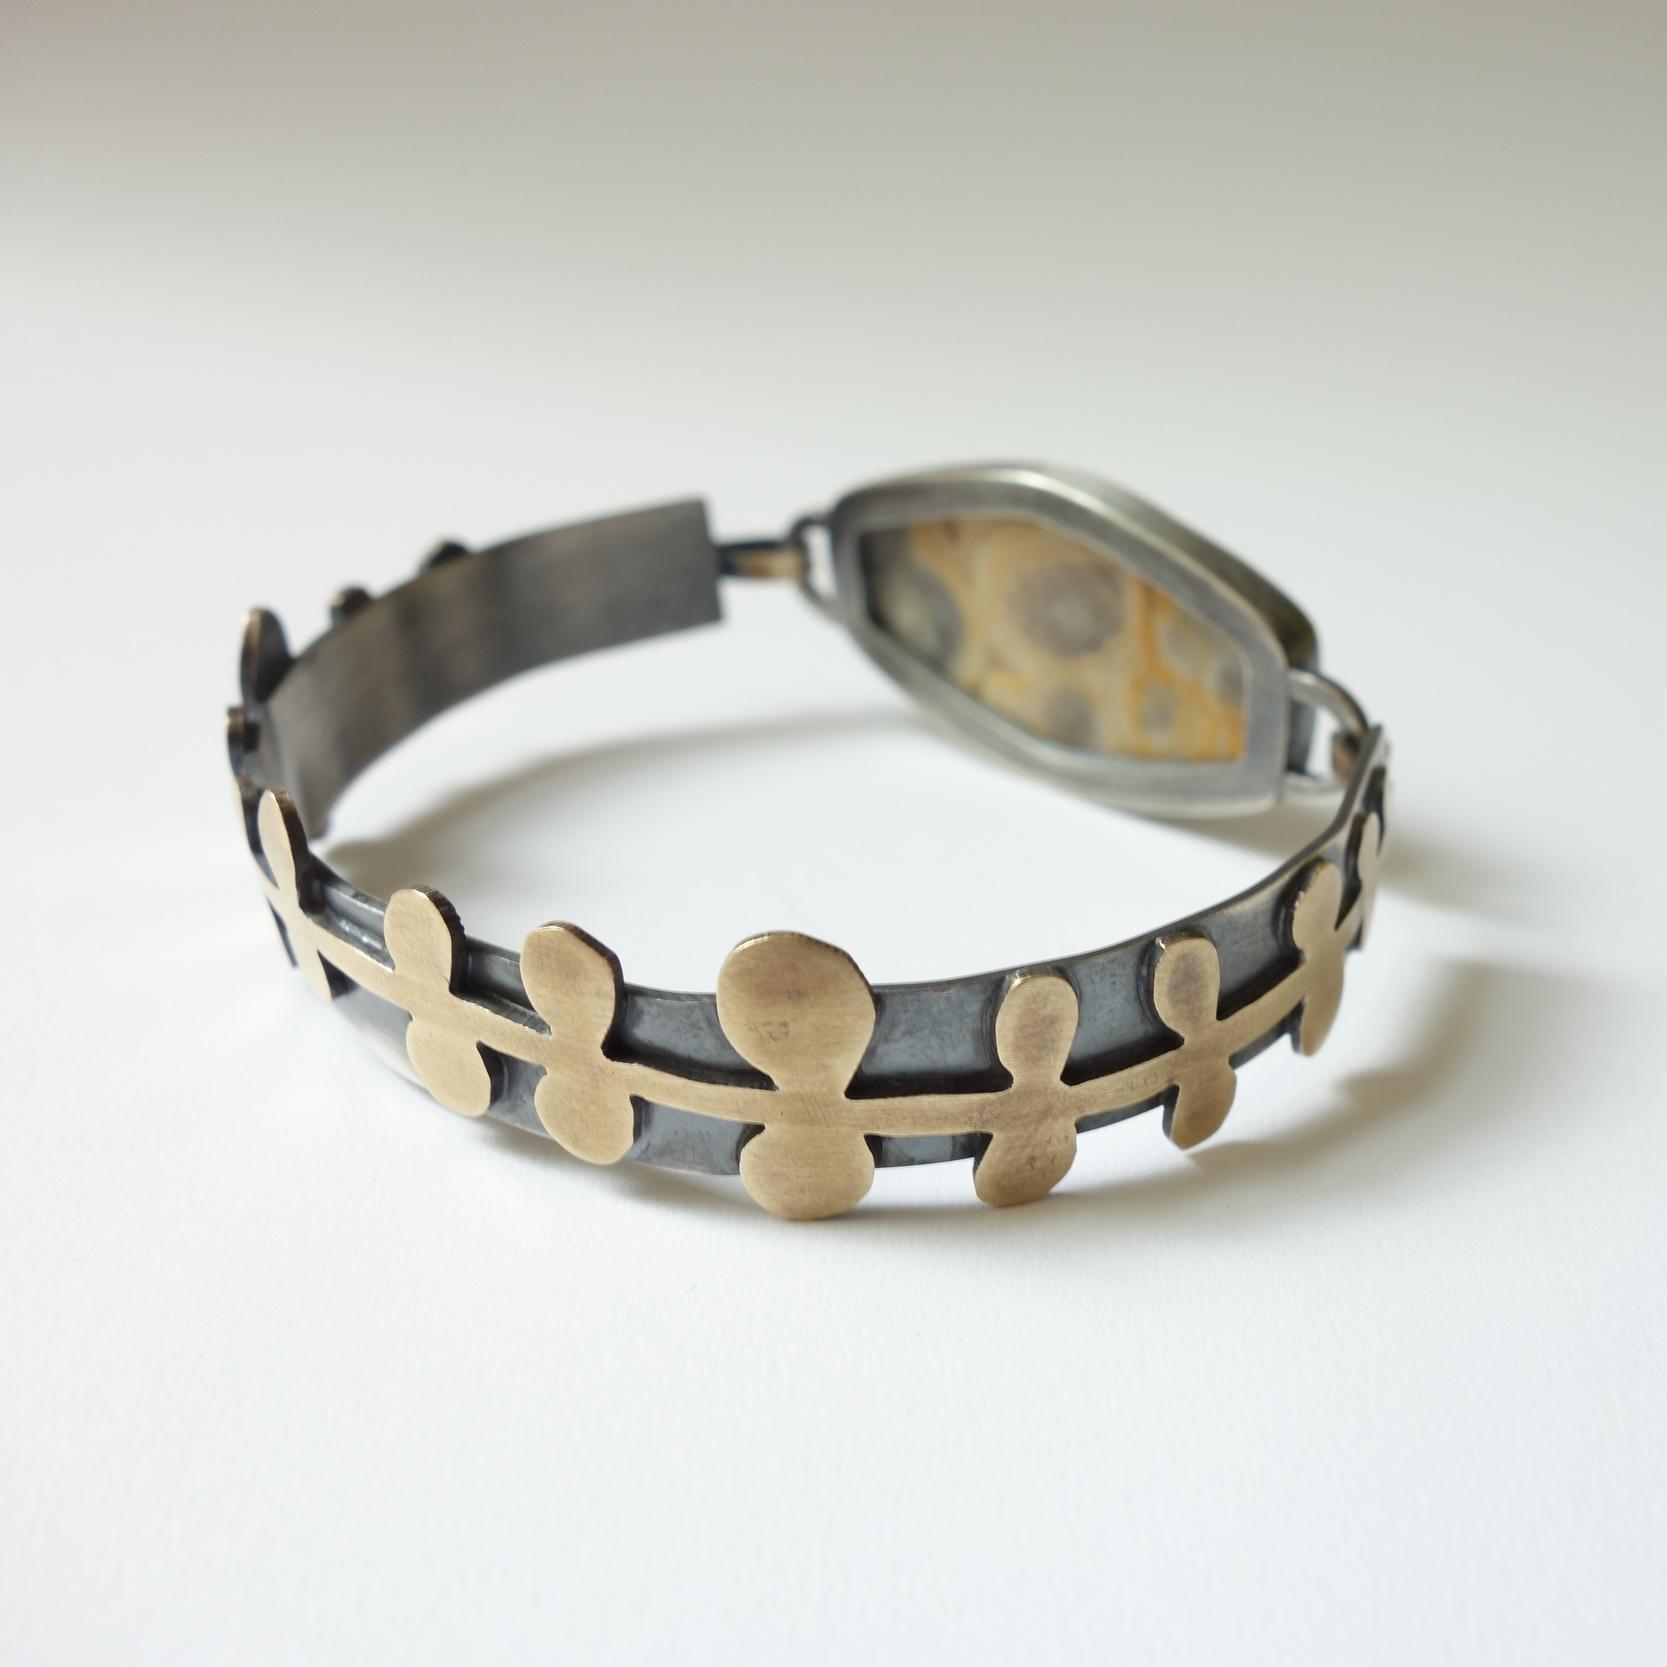 Whimsical Cuff Bracelet kansas city merit made meritmade kc handmade jewelry art jewelry unique jewelry